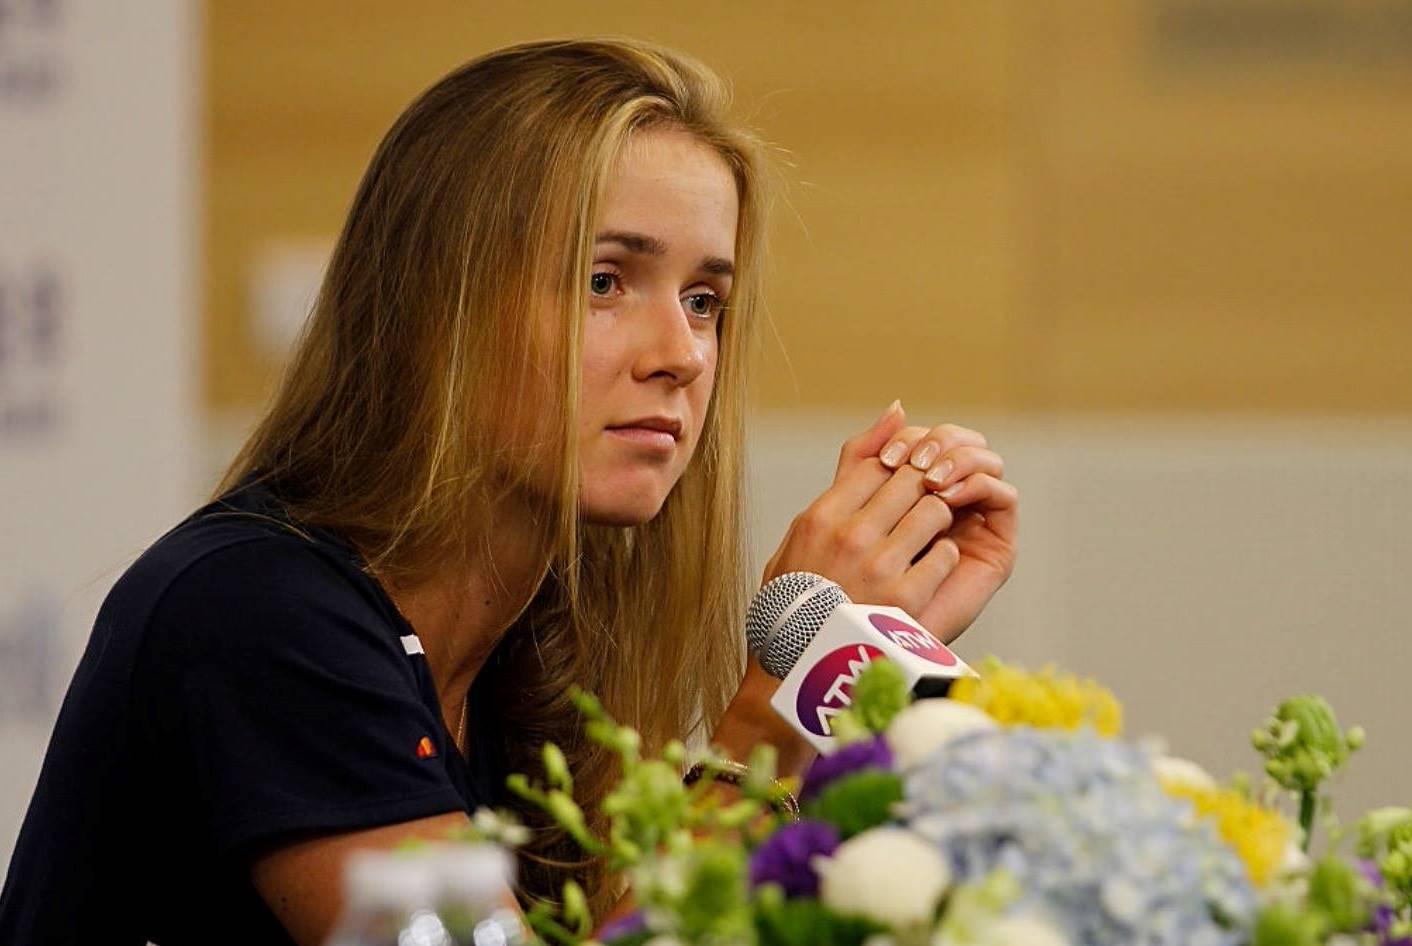 Diosa ucraniana da el batacazo y derrota a la n1 del mundo